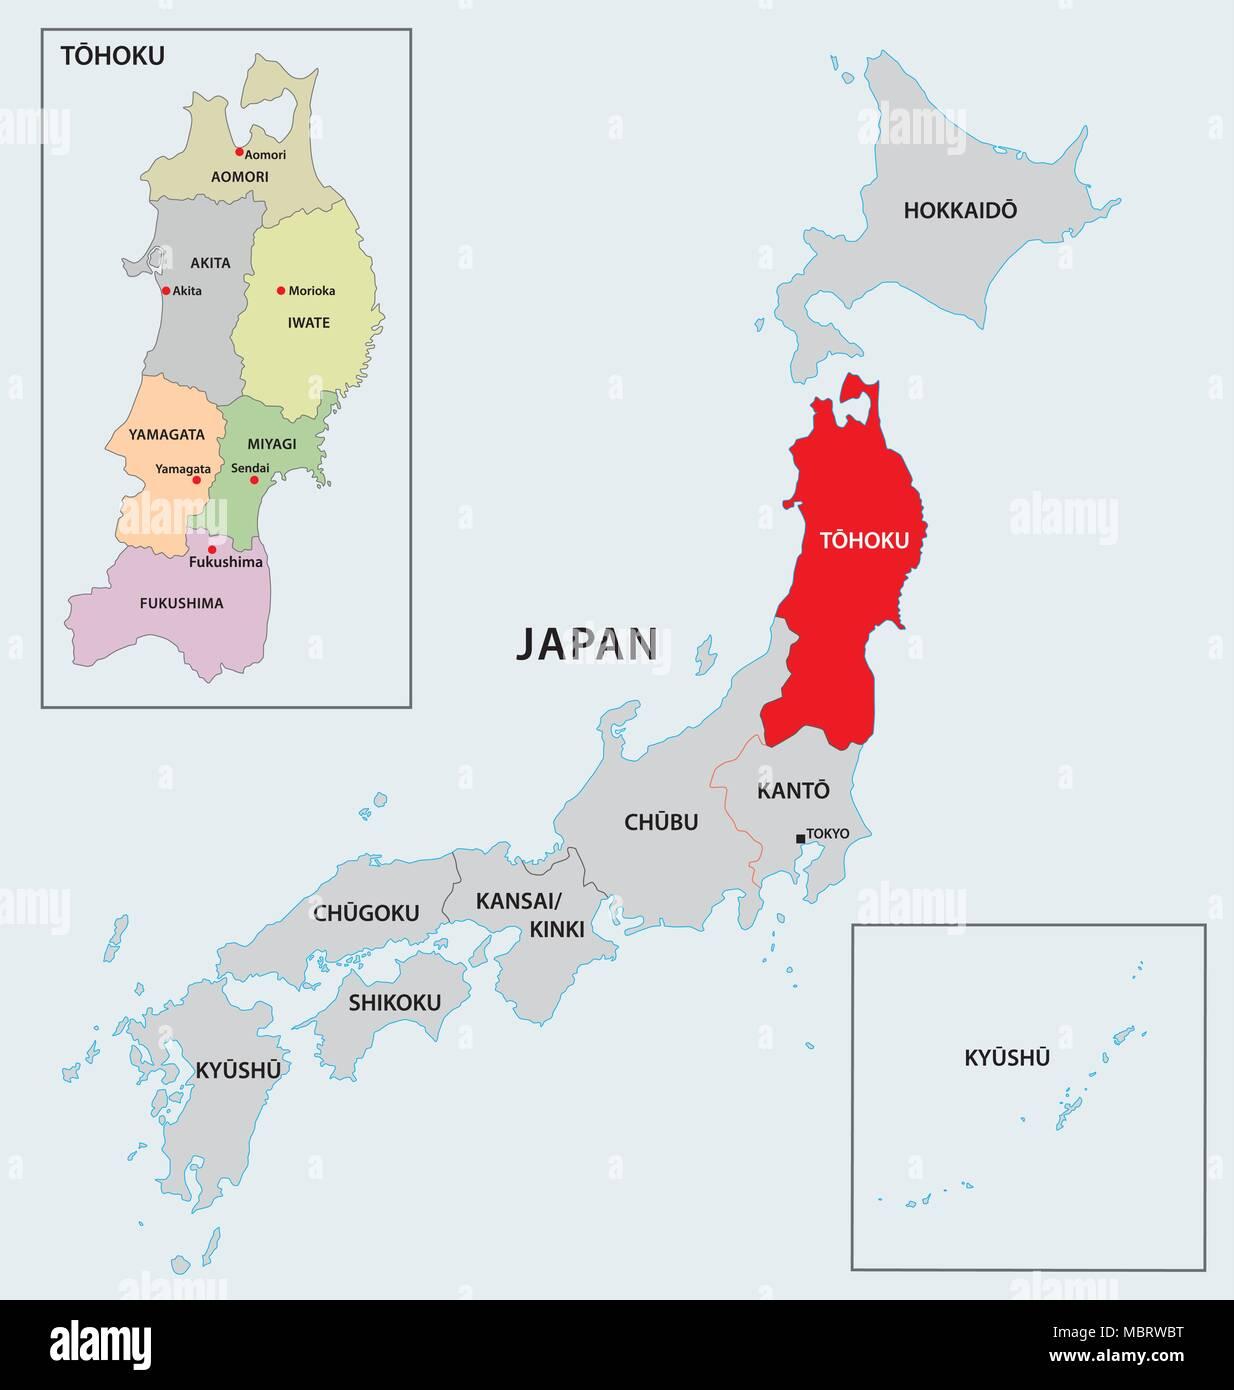 japan region tohoku map - Stock Vector